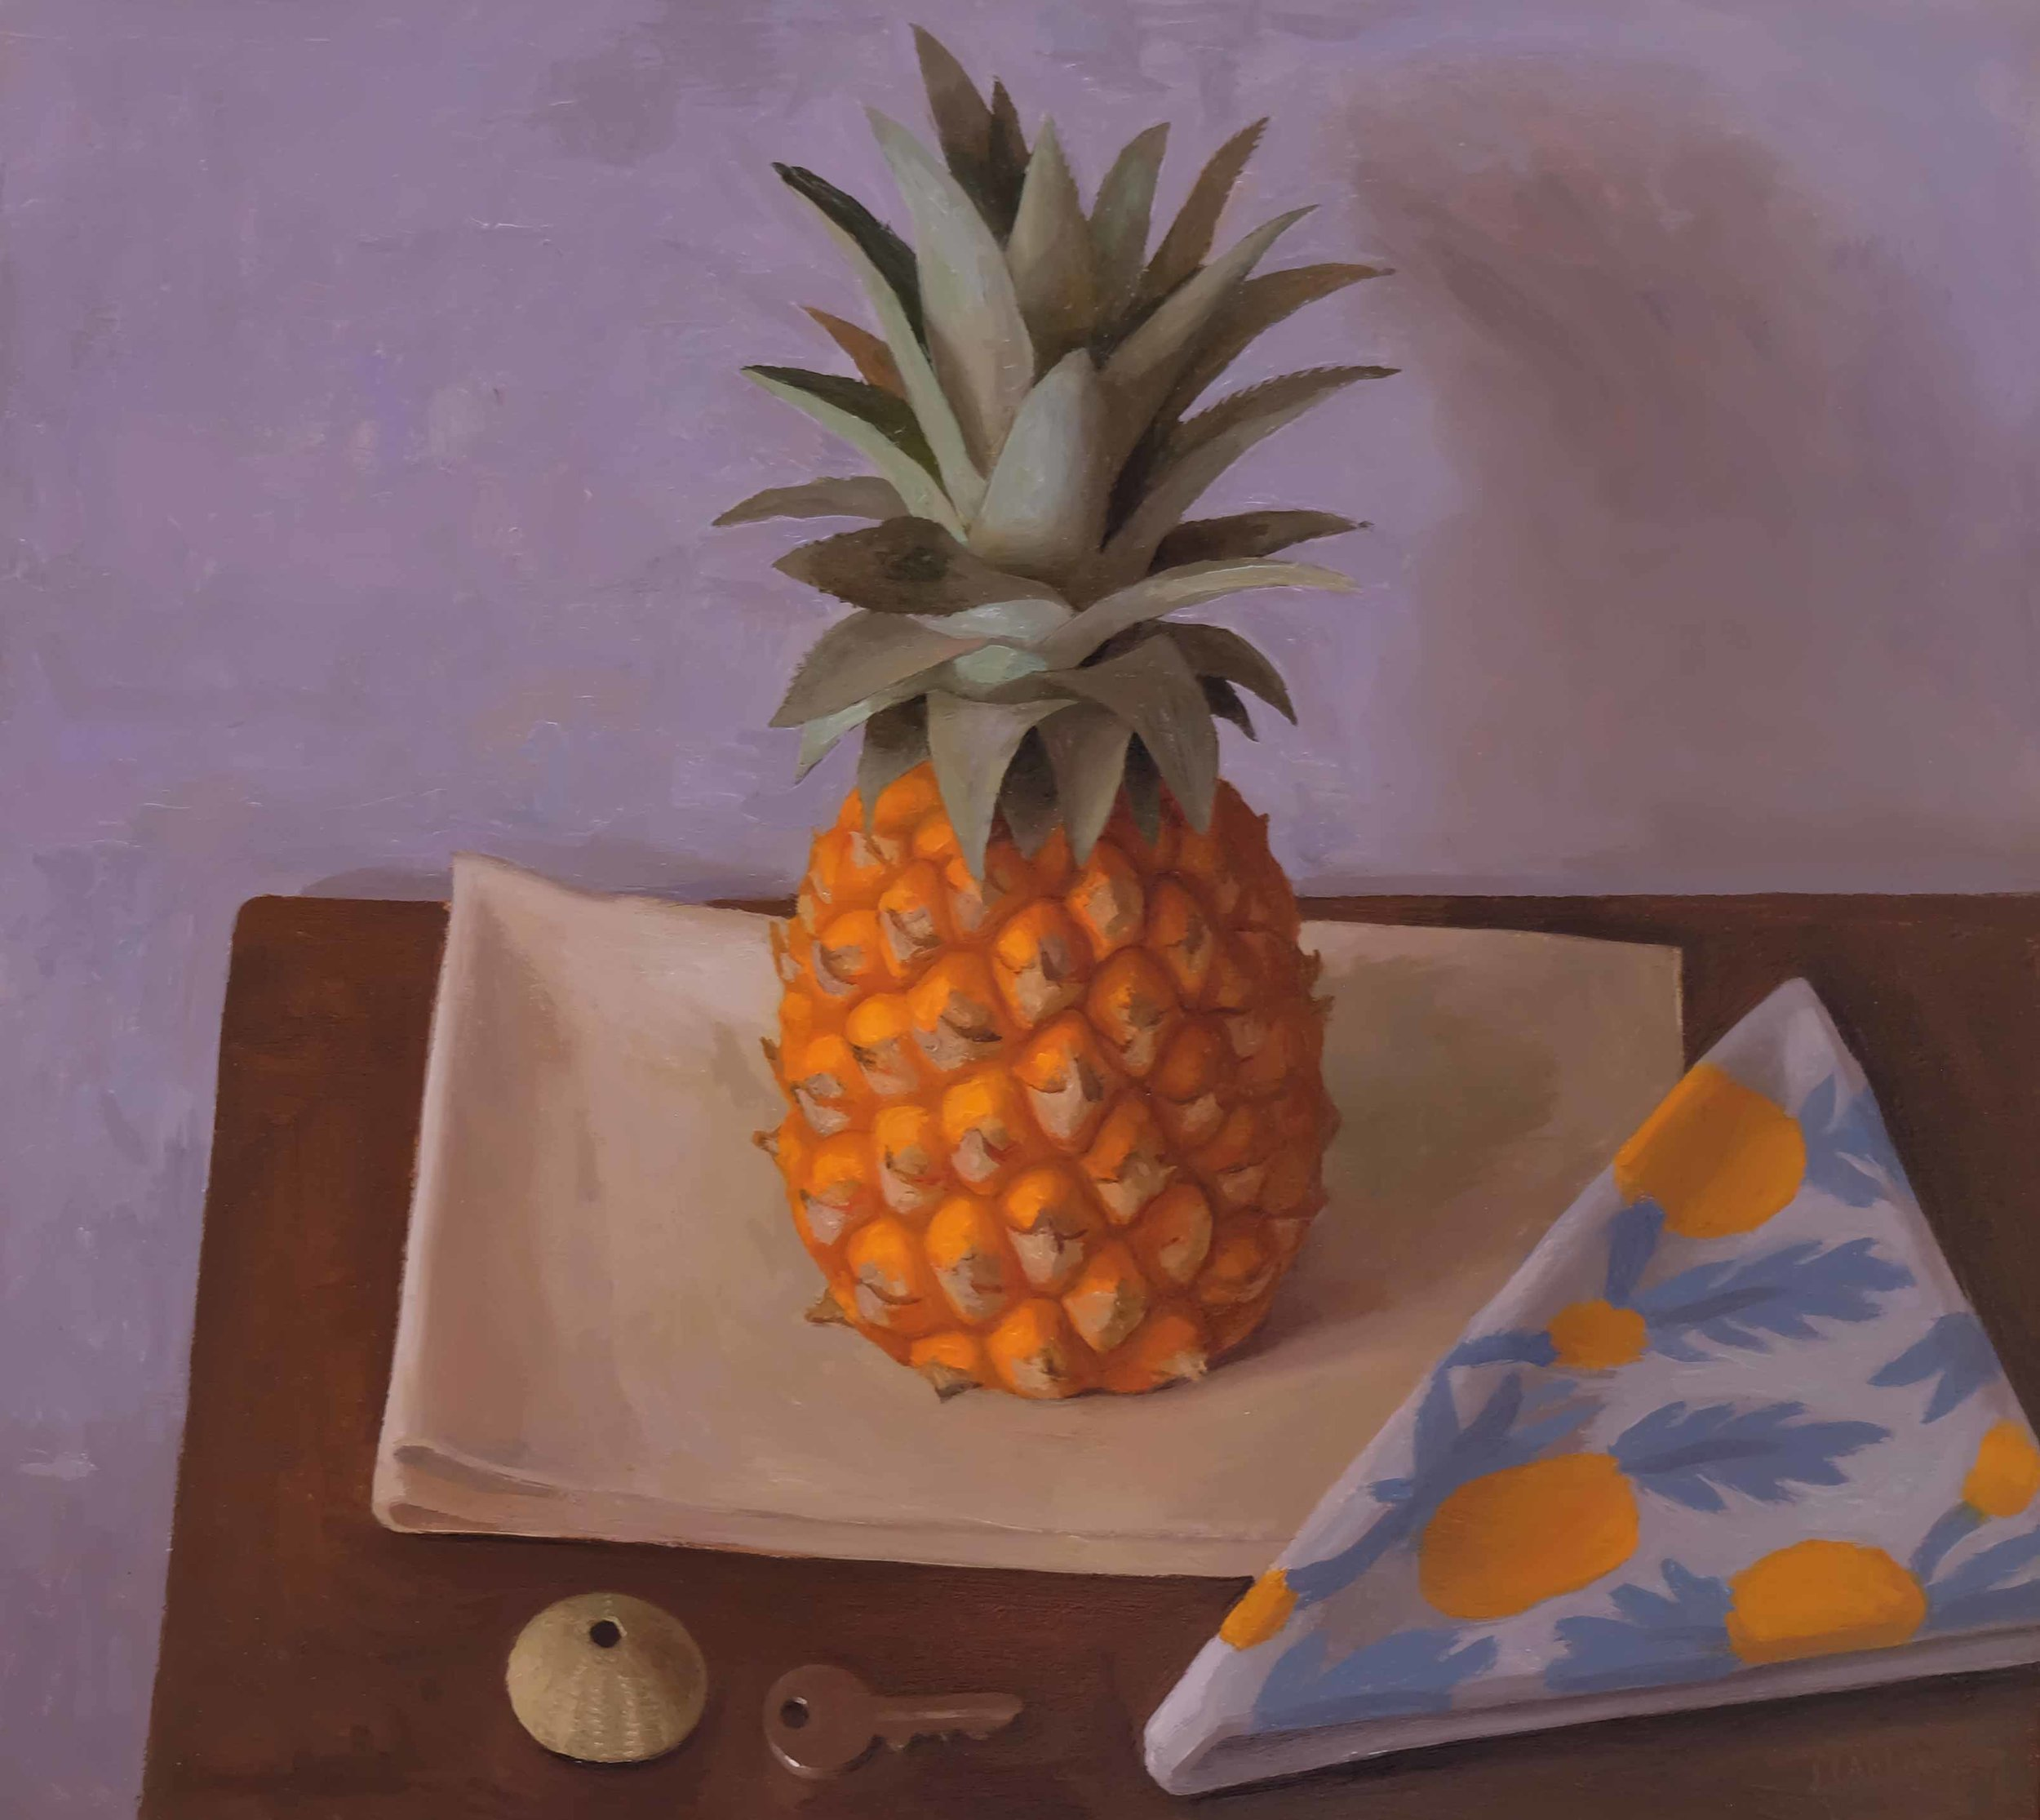 Pineapple-and-key.jpg